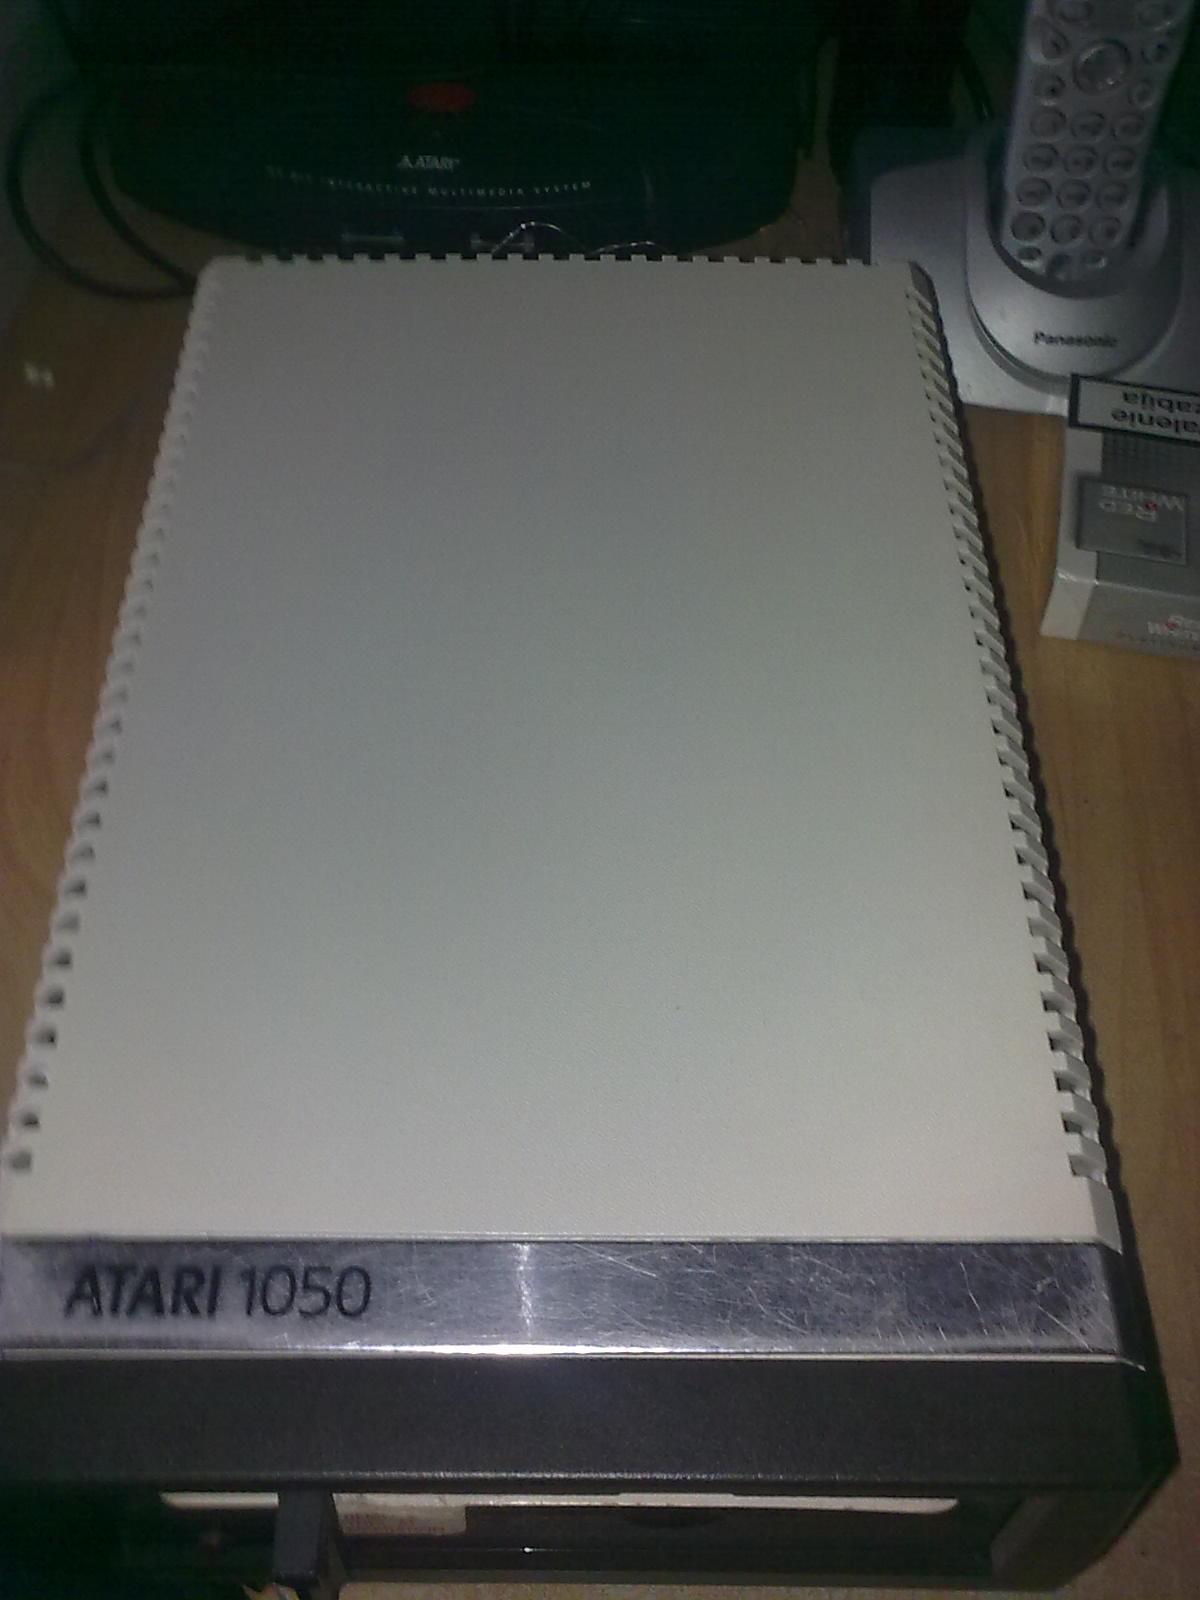 http://atariarea.krap.pl/files/20100522311.jpg